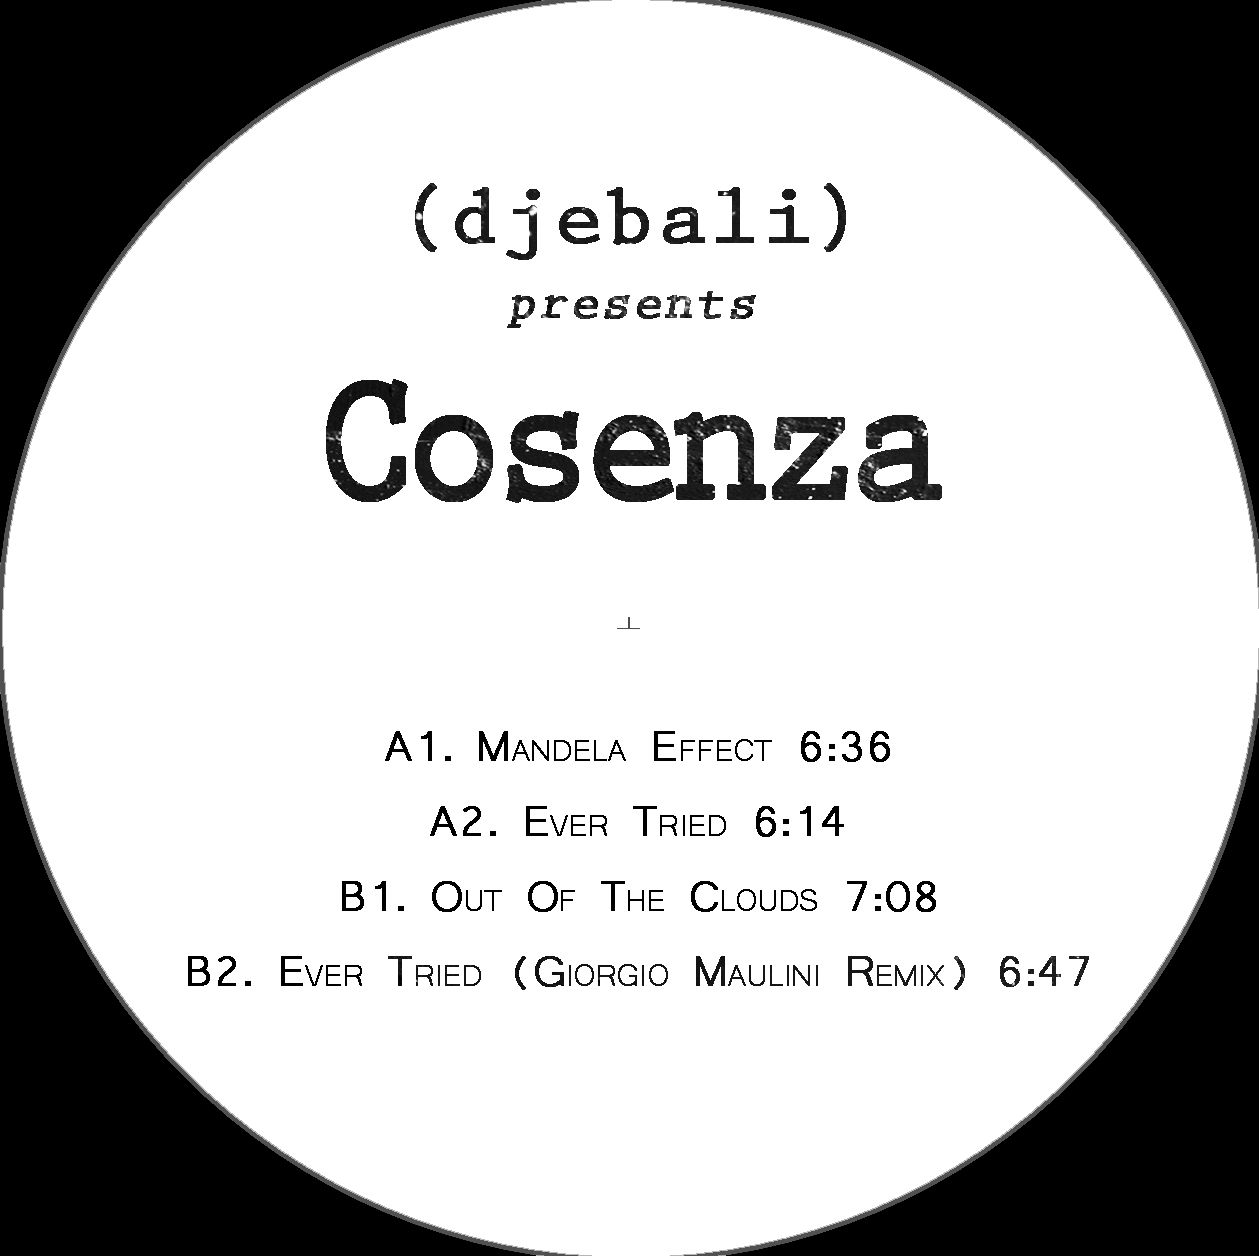 Cosenza - EP Giorgio Maulini remix